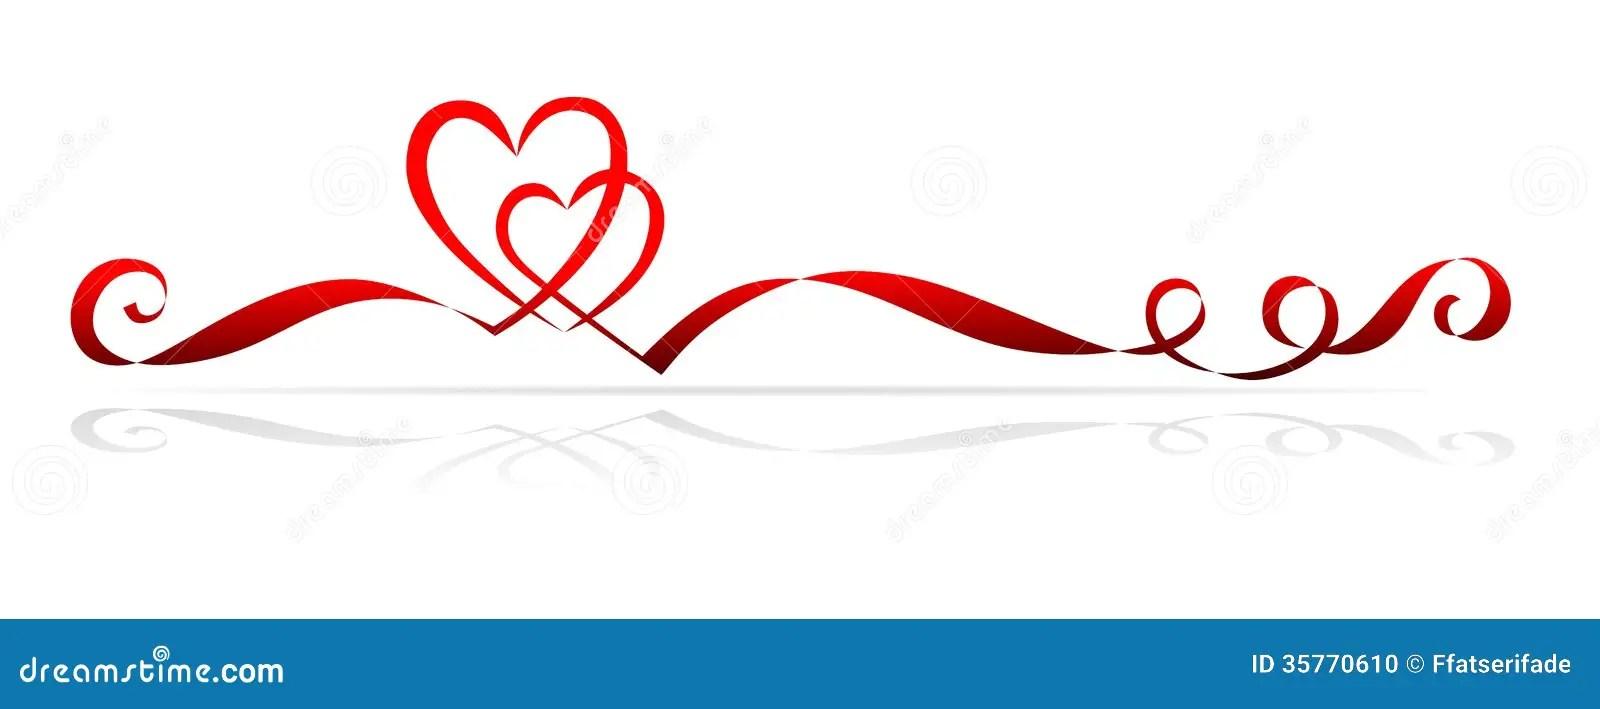 Simple Heart Stock Illustration Illustration Of Swing